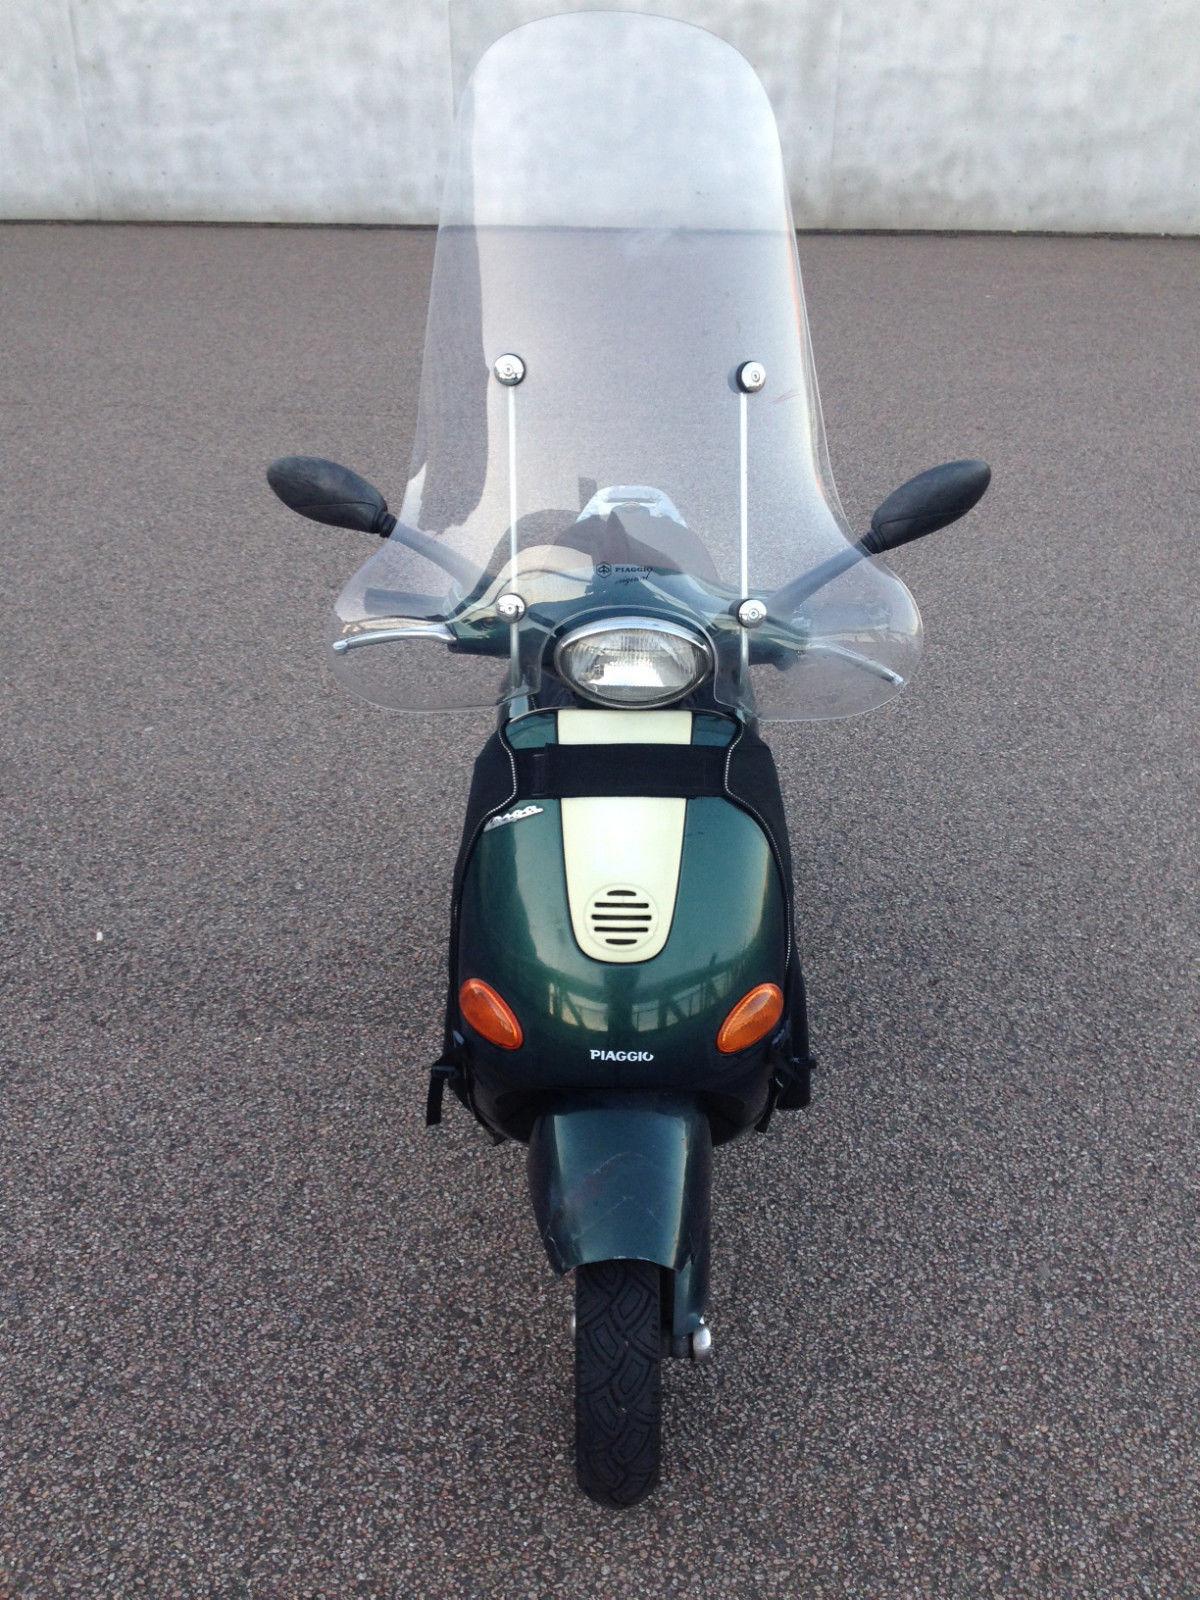 piaggio vespa scooter et4 125cc in racing green. Black Bedroom Furniture Sets. Home Design Ideas